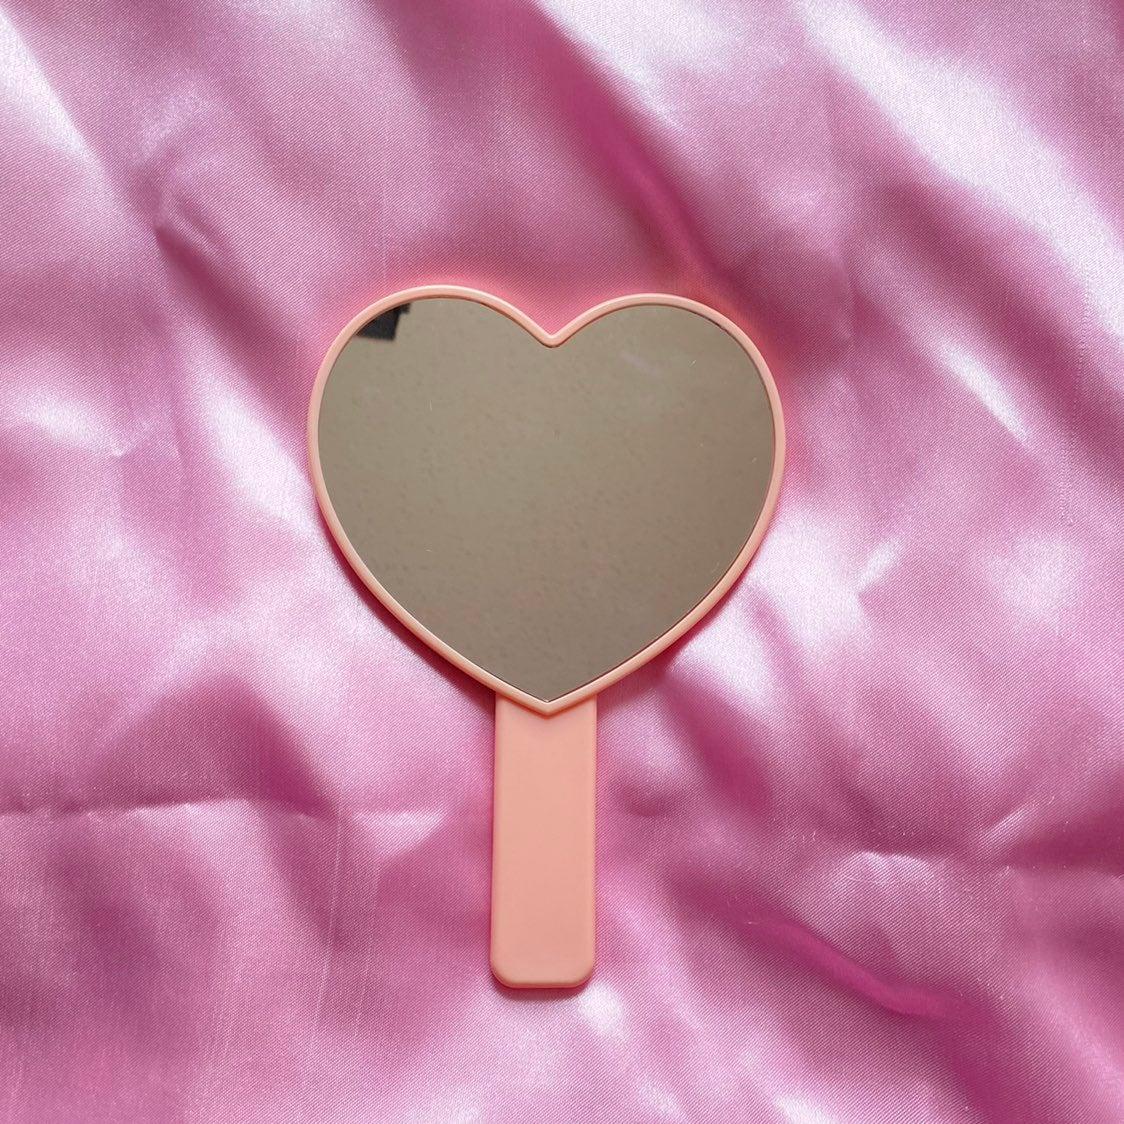 Pastel Pink Heart Shape Mirror